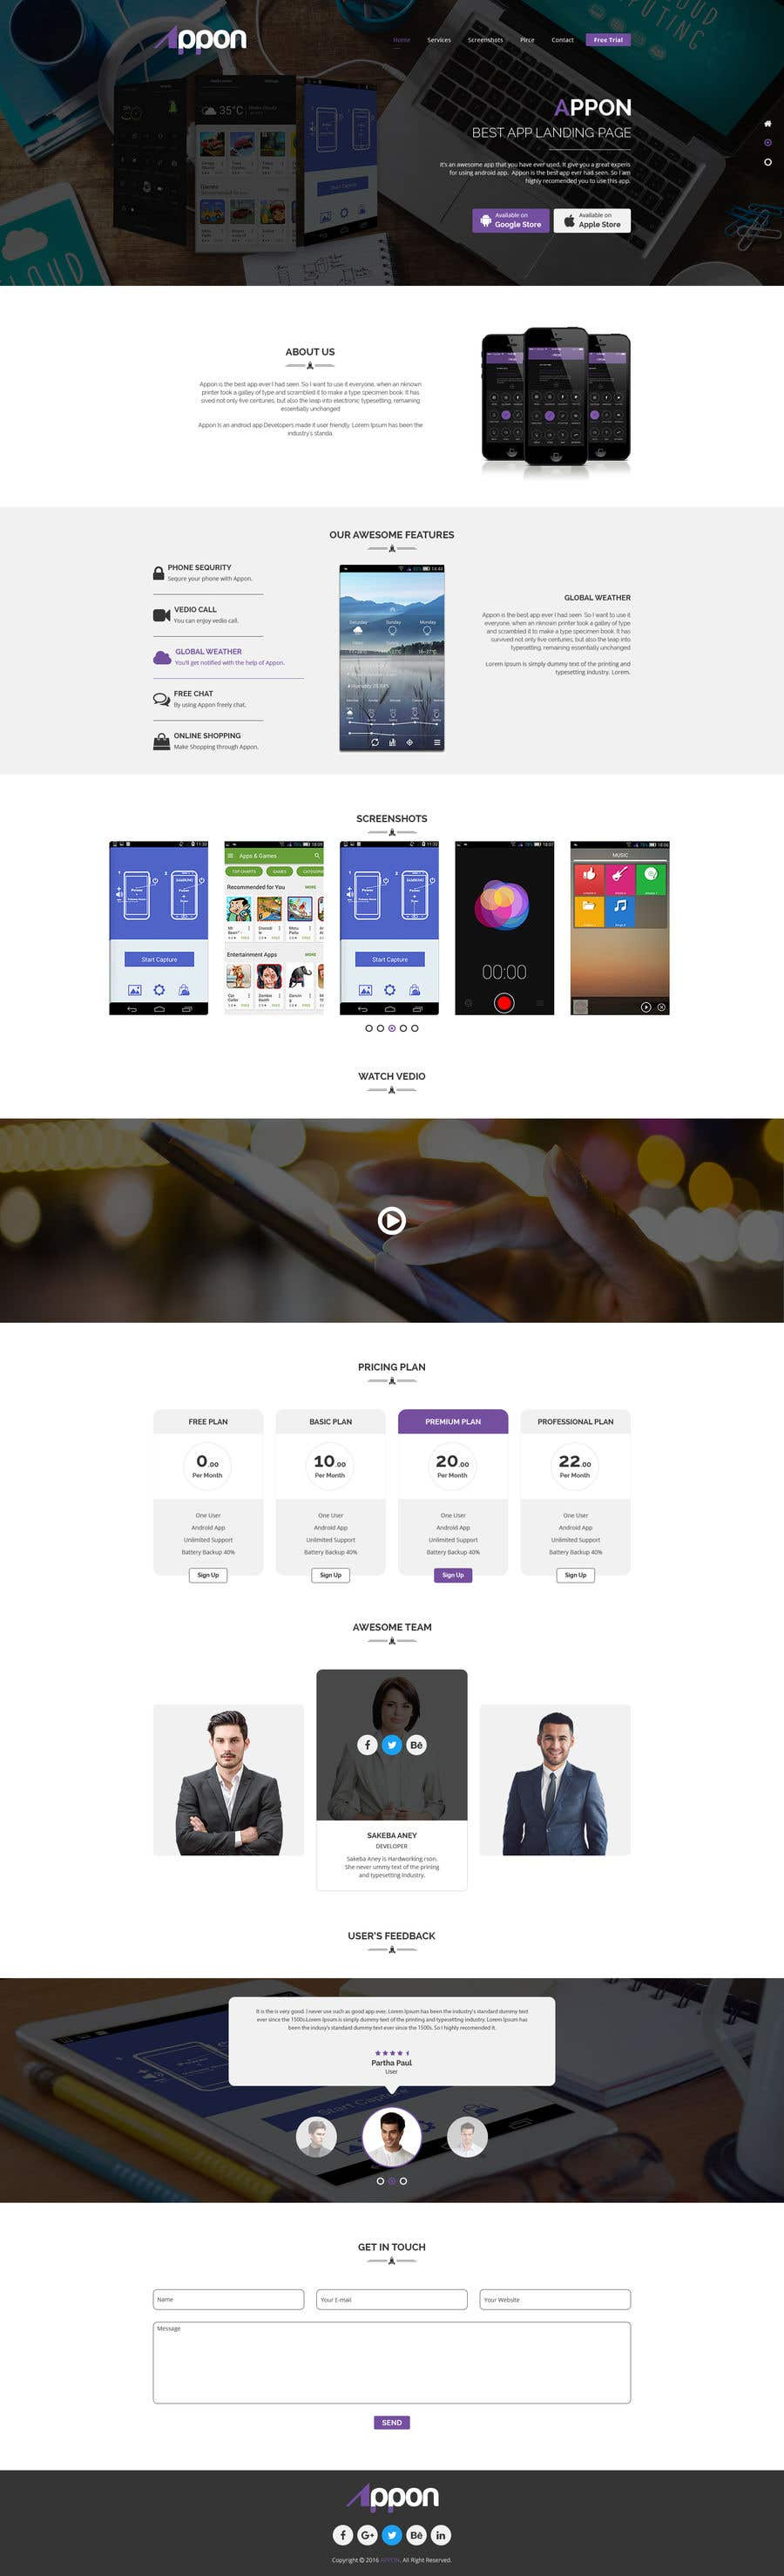 Kilpailutyö #                                        37                                      kilpailussa                                         Looking for best Website Landing Page Designer for My Product Landing Page